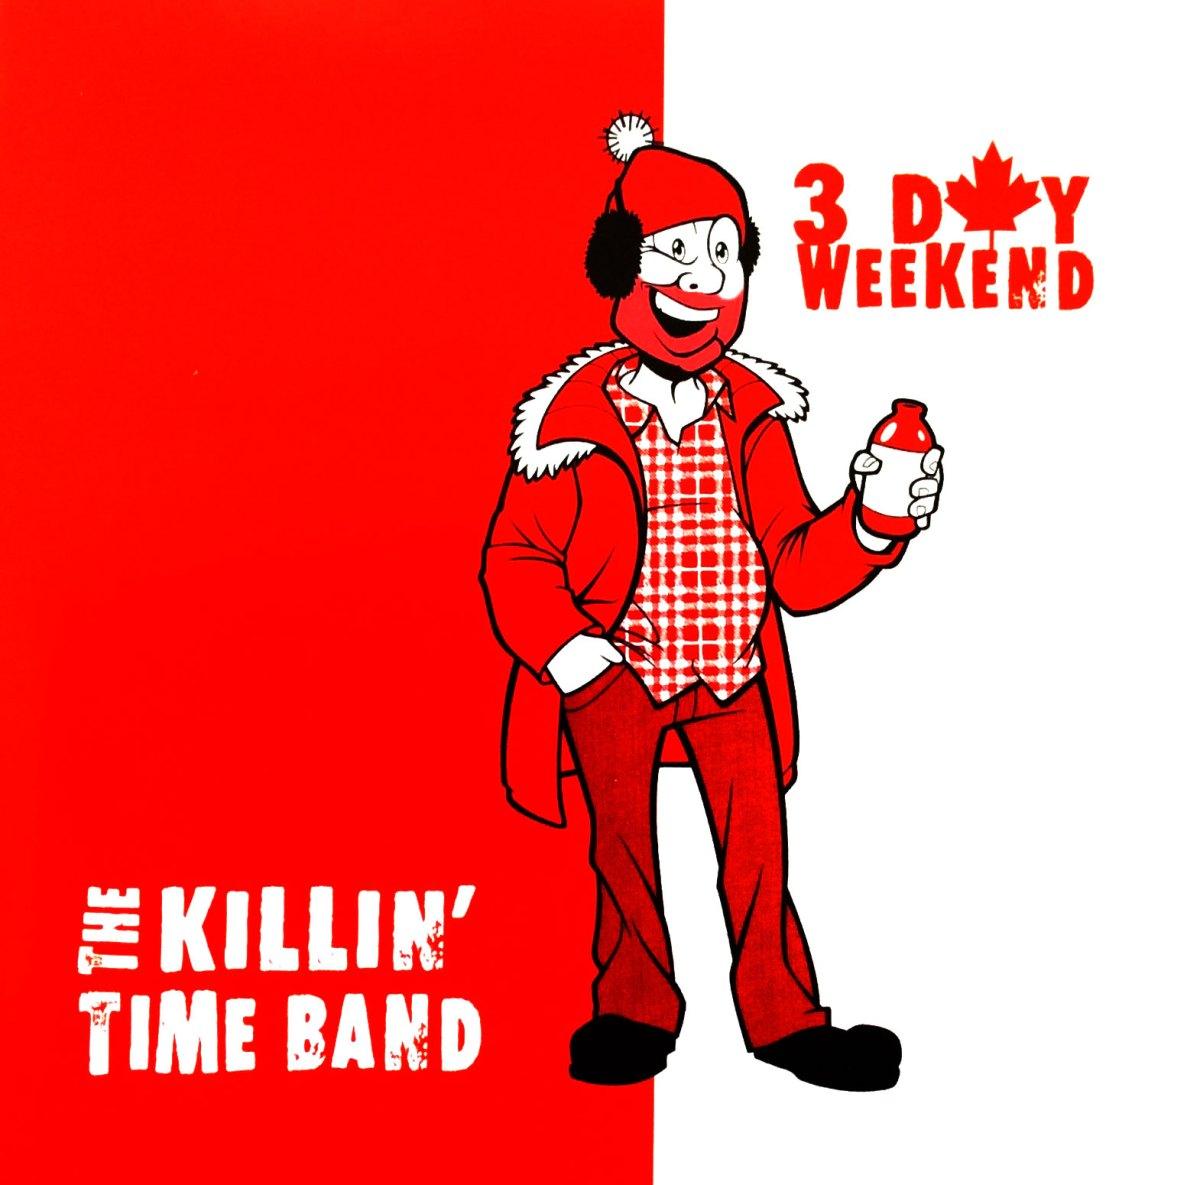 Killin-Time-band